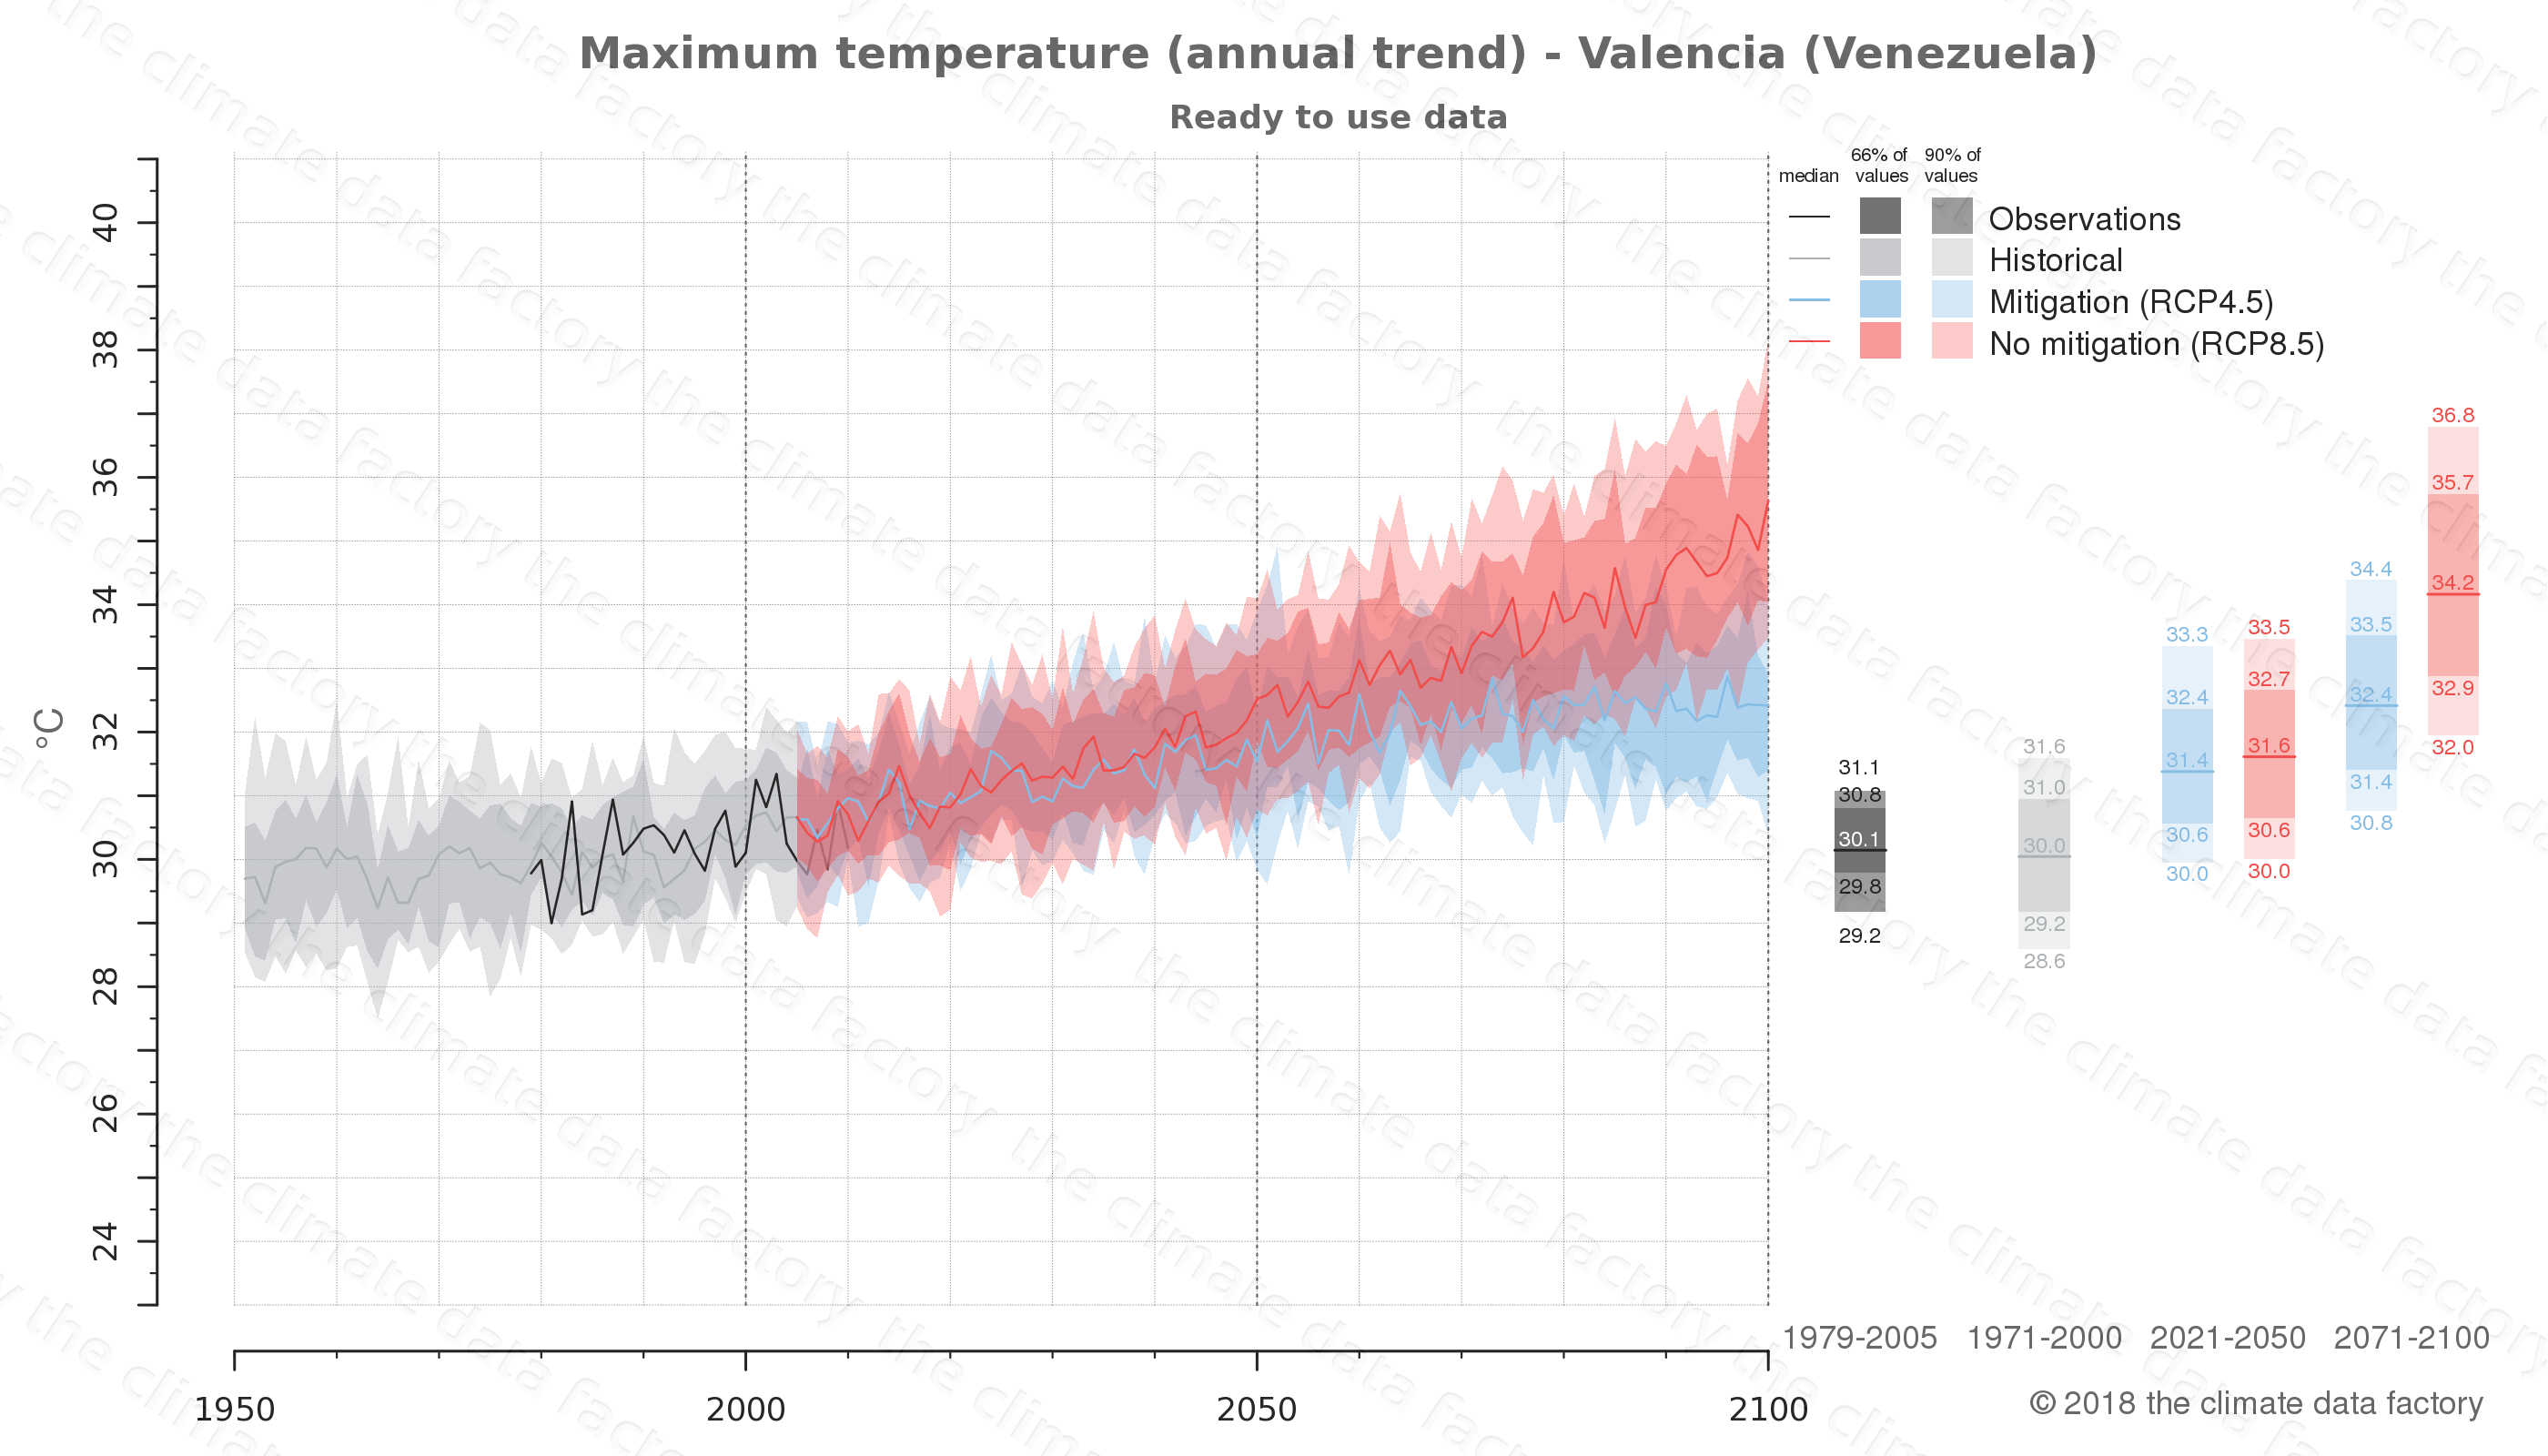 climate change data policy adaptation climate graph city data maximum-temperature valencia venezuela